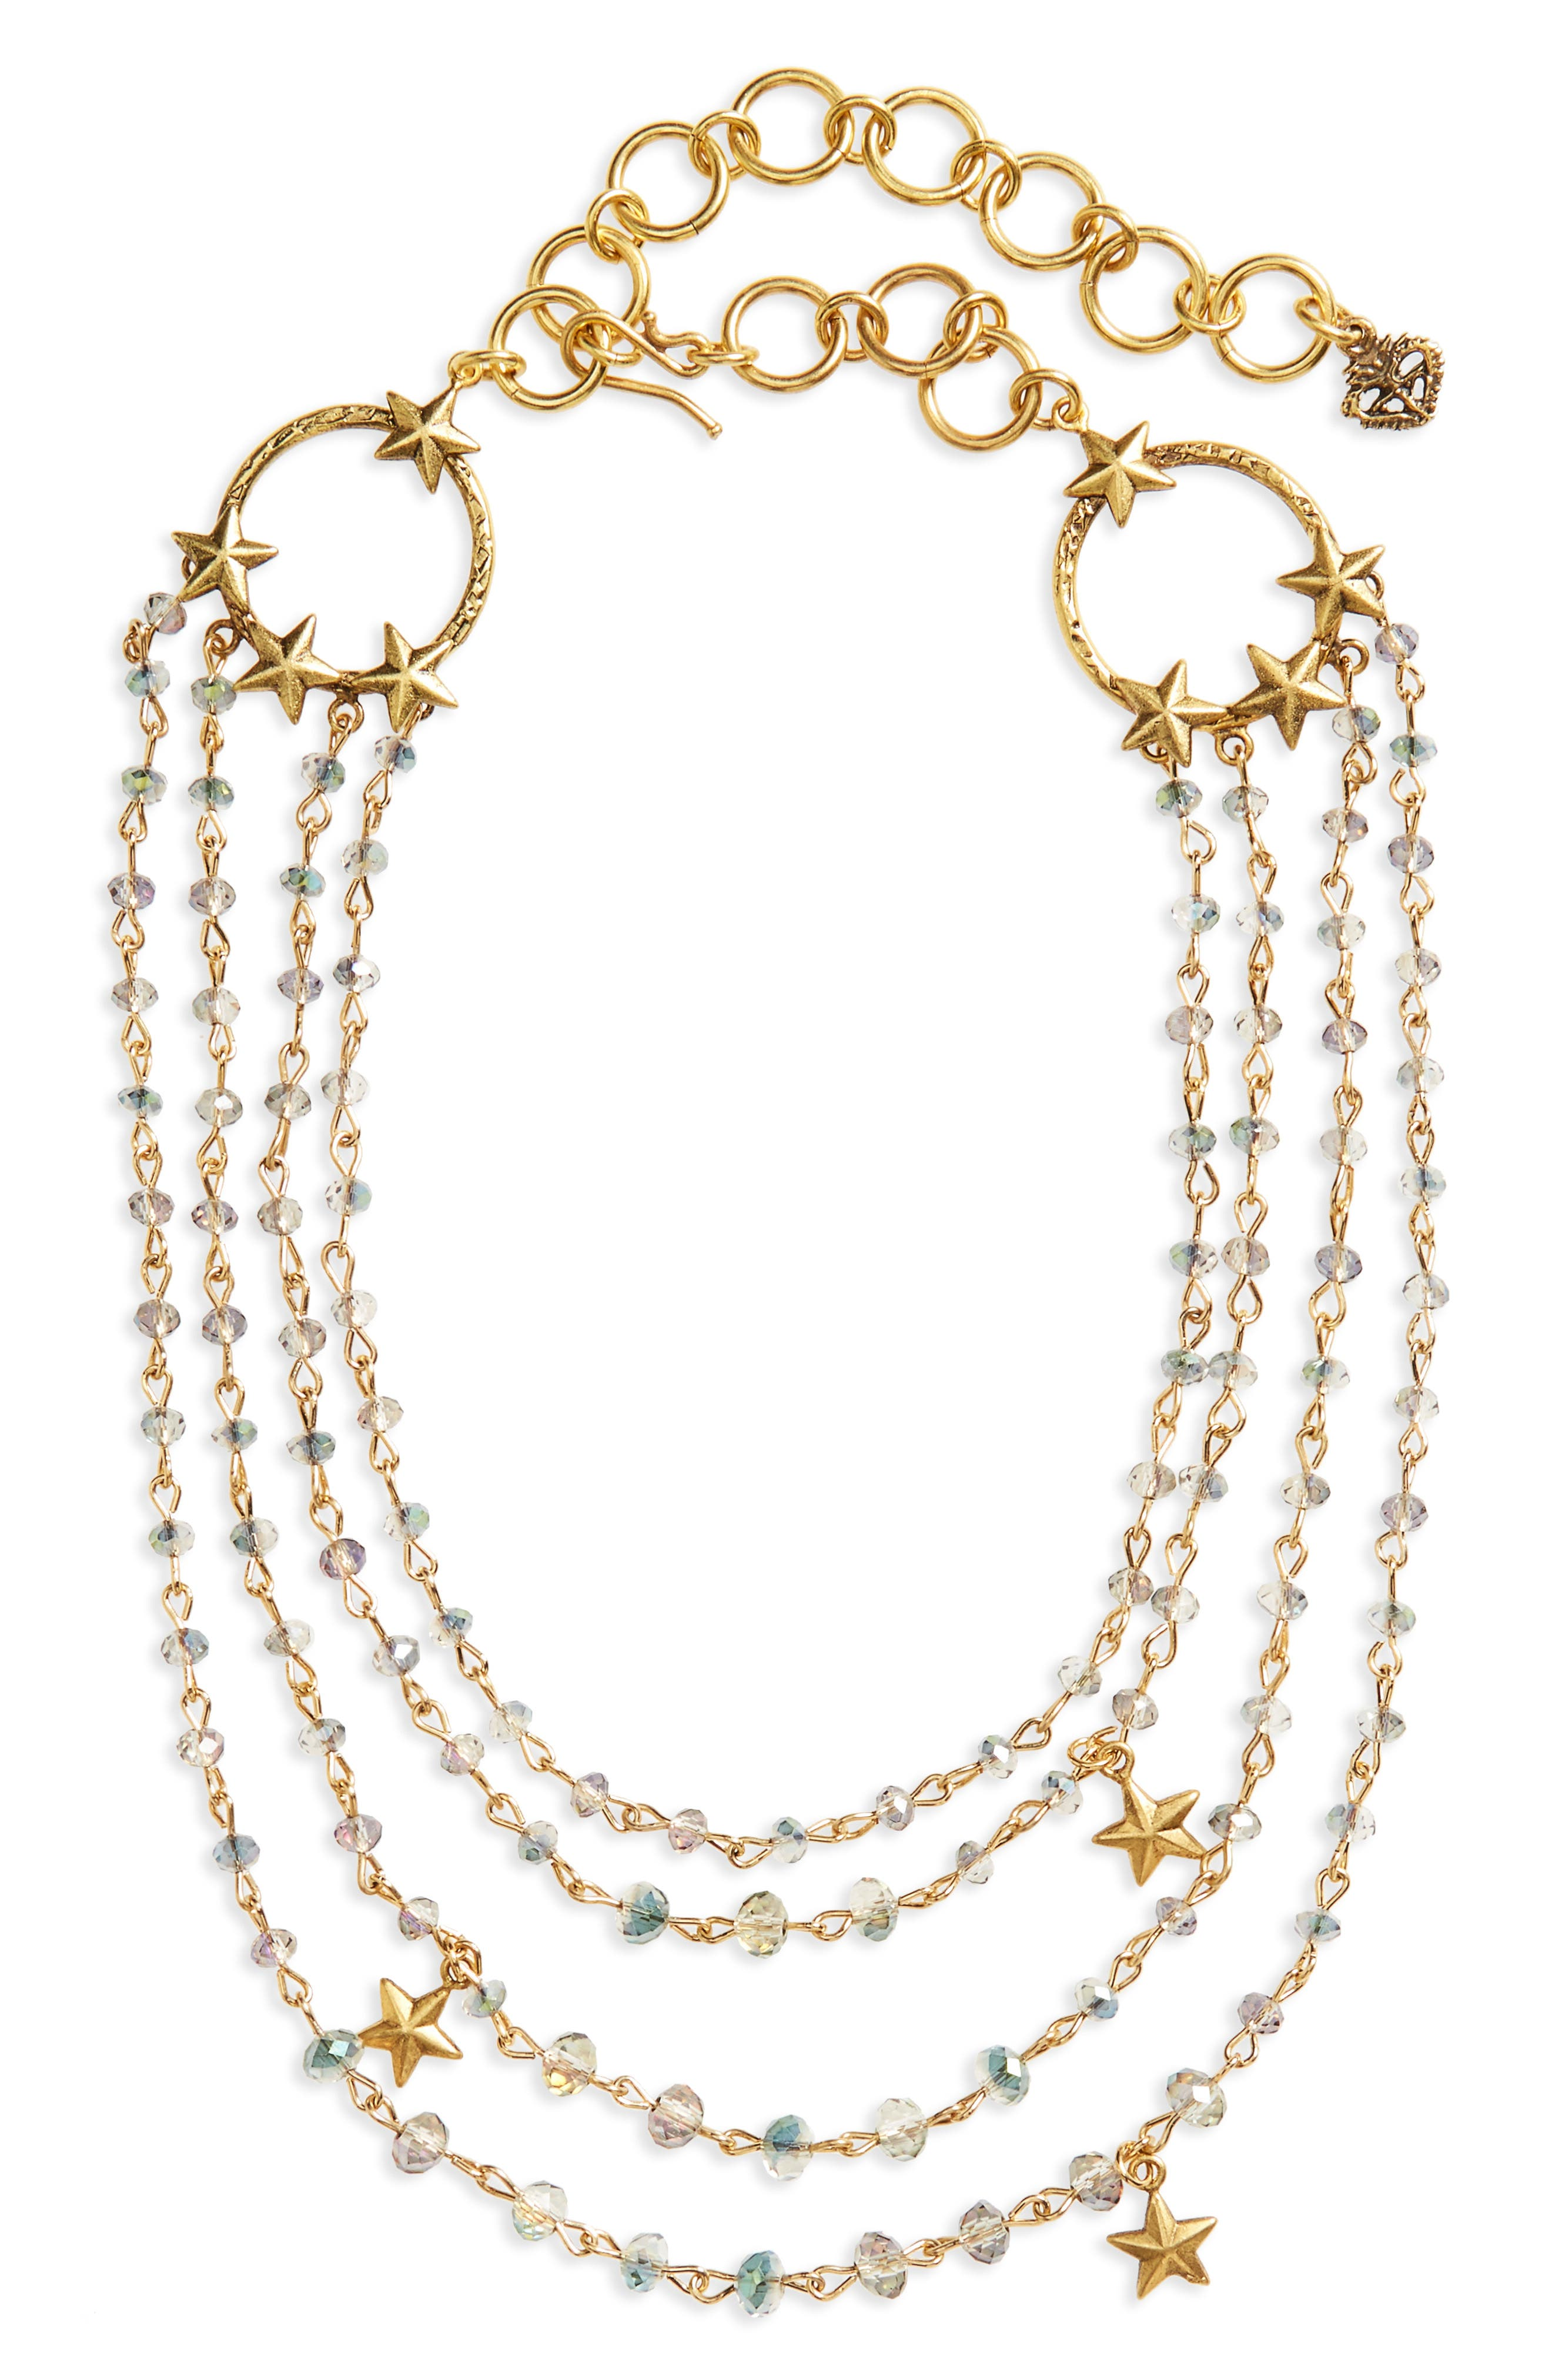 Main Image - Virgins Saints & Angels Coronation Crystal Magdalena Multistrand Necklace